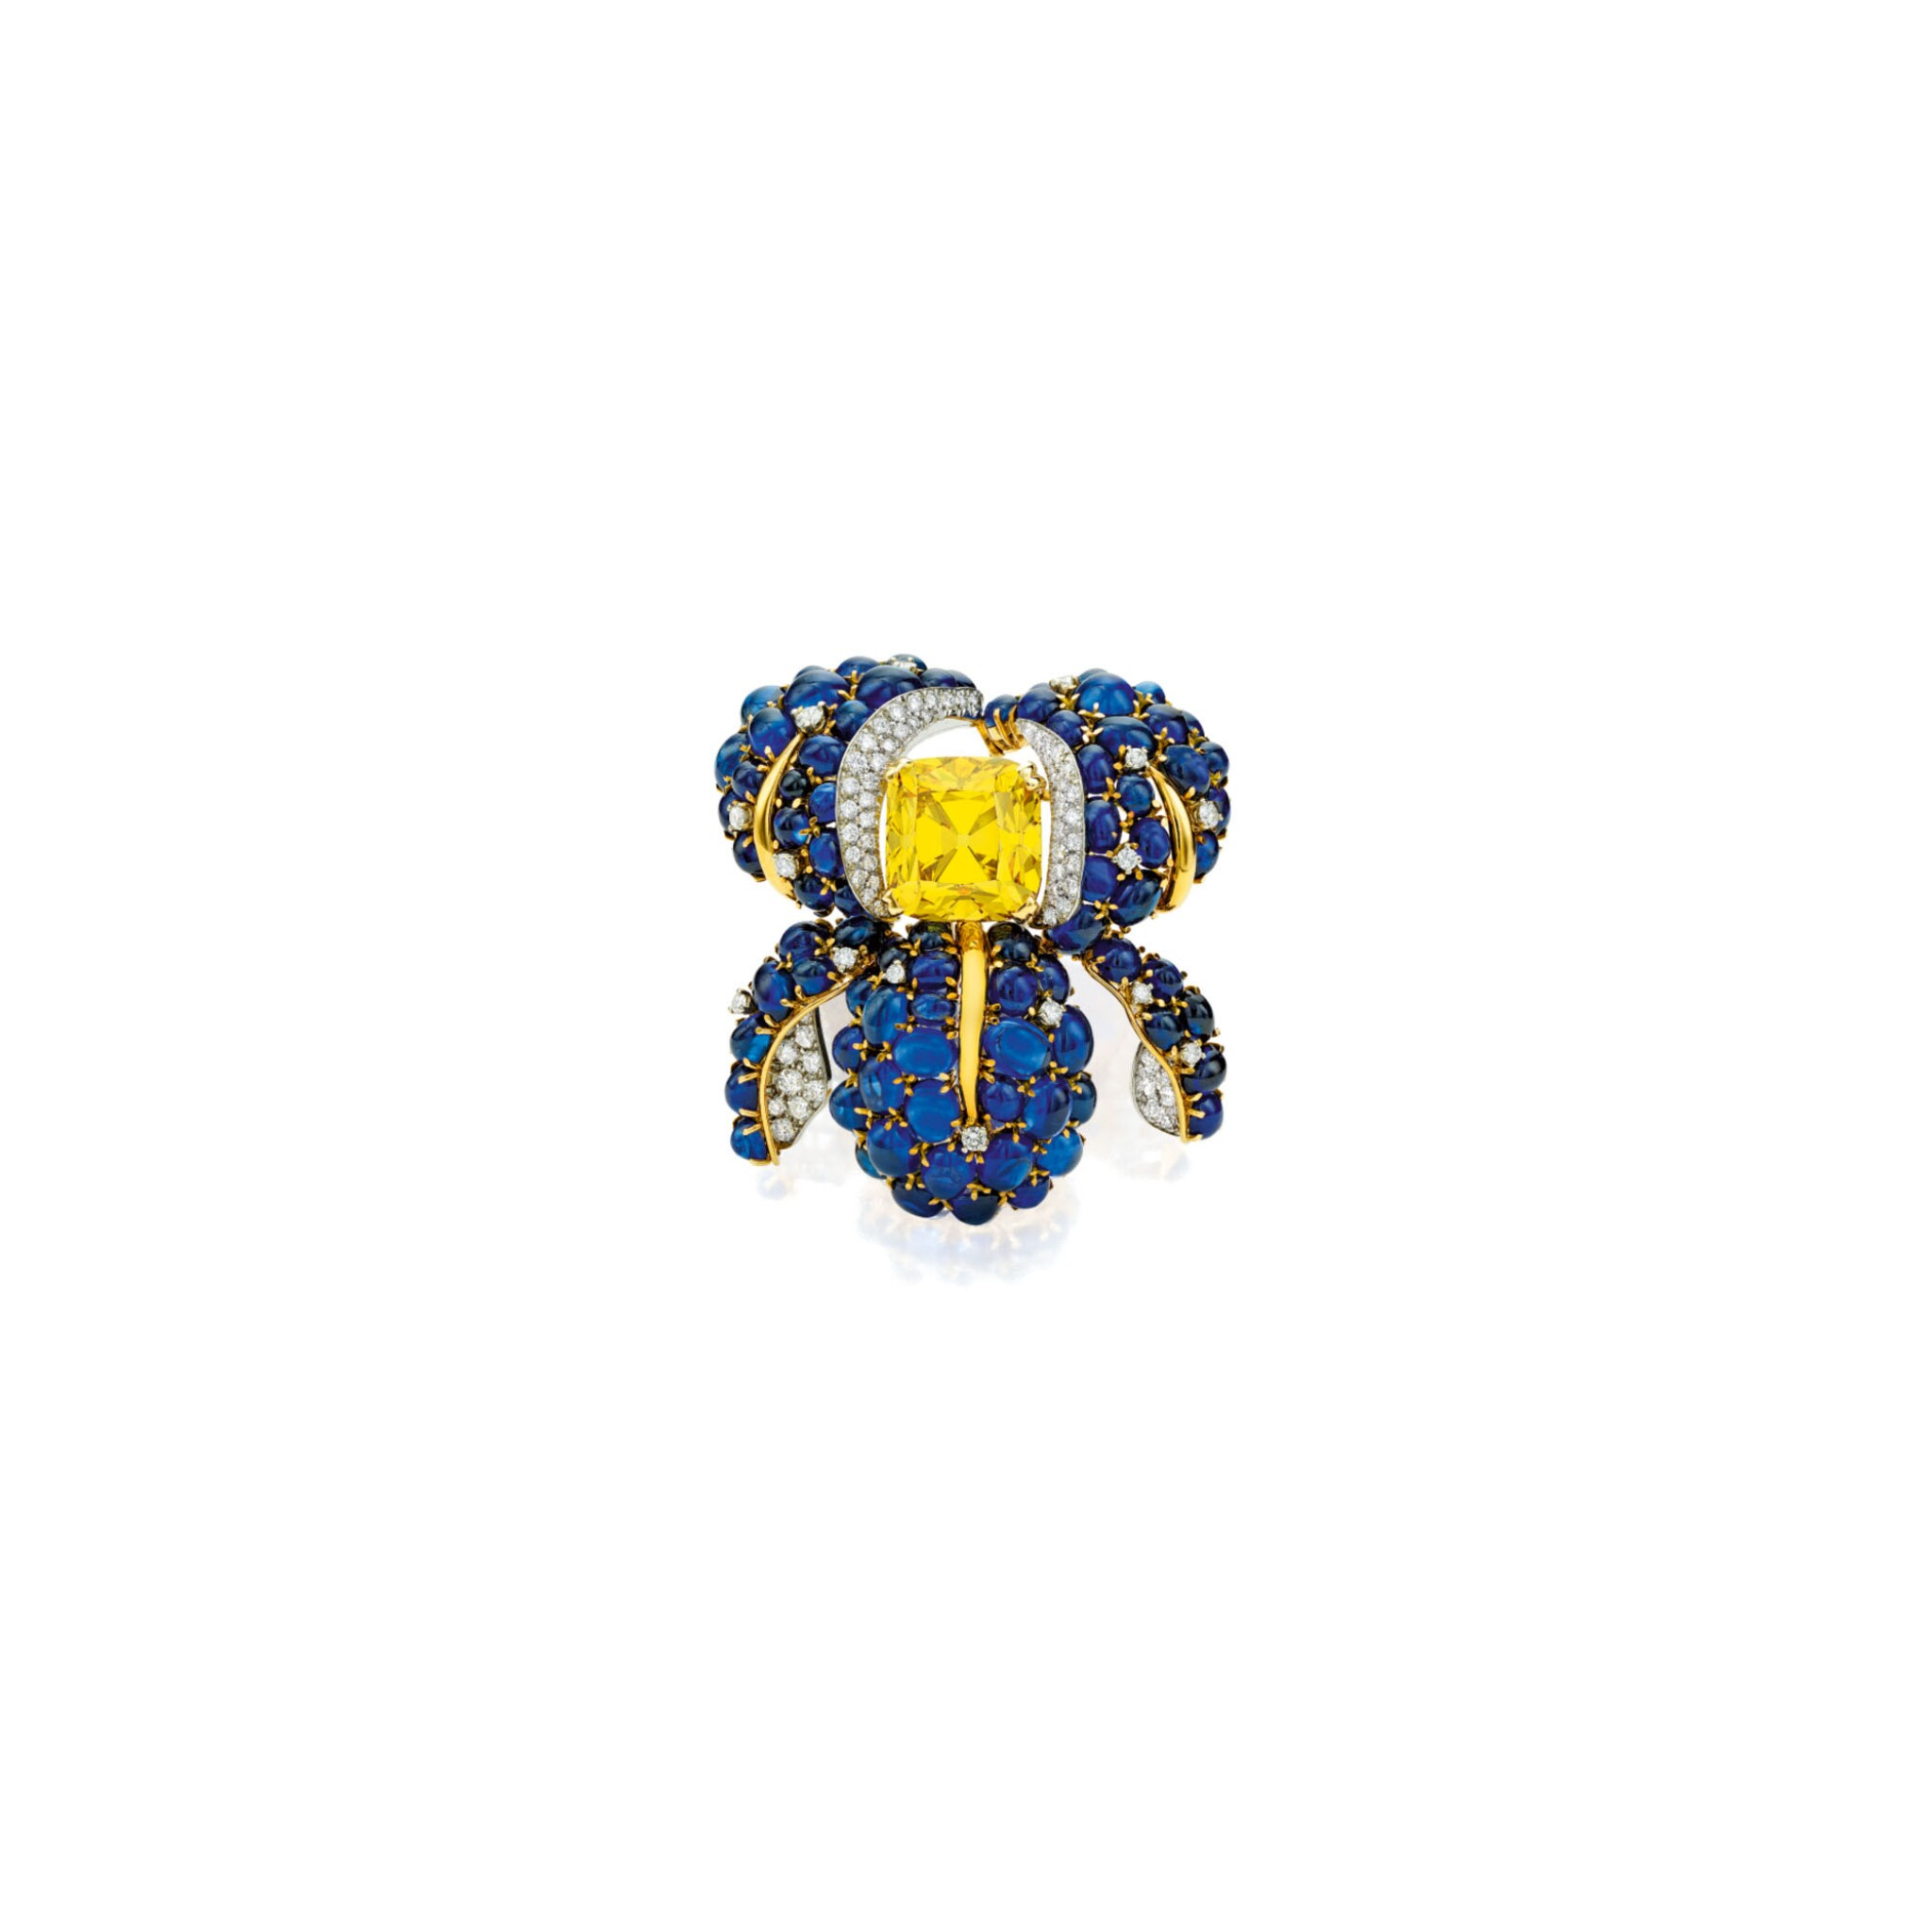 View full screen - View 1 of Lot 497. AN EXCEPTIONAL FANCY VIVID YELLOW DIAMOND, DIAMOND AND SAPPHIRE CLIP-BROOCH, VERDURA   艷彩黃色鑽石配鑽石及藍寶石別針一枚,Verdura.